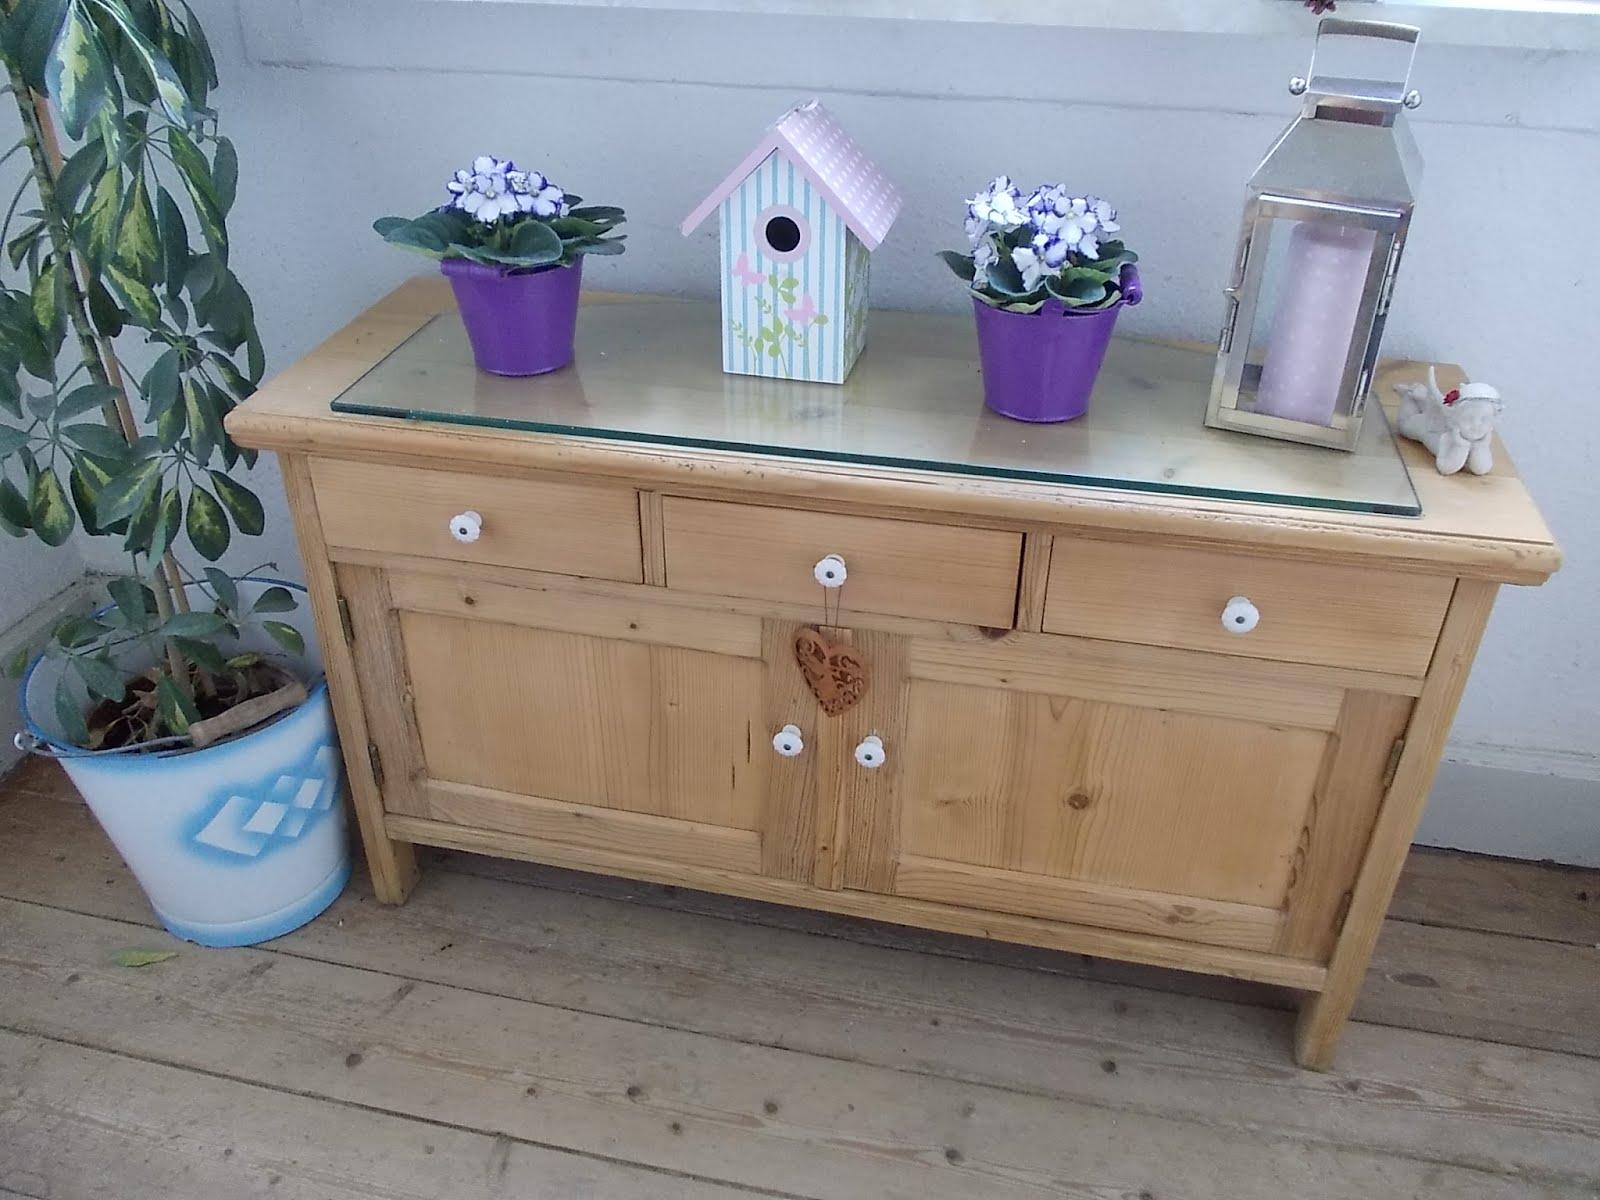 rosenreslis traum rosa k chenkasterl himmelblaue h kelei. Black Bedroom Furniture Sets. Home Design Ideas